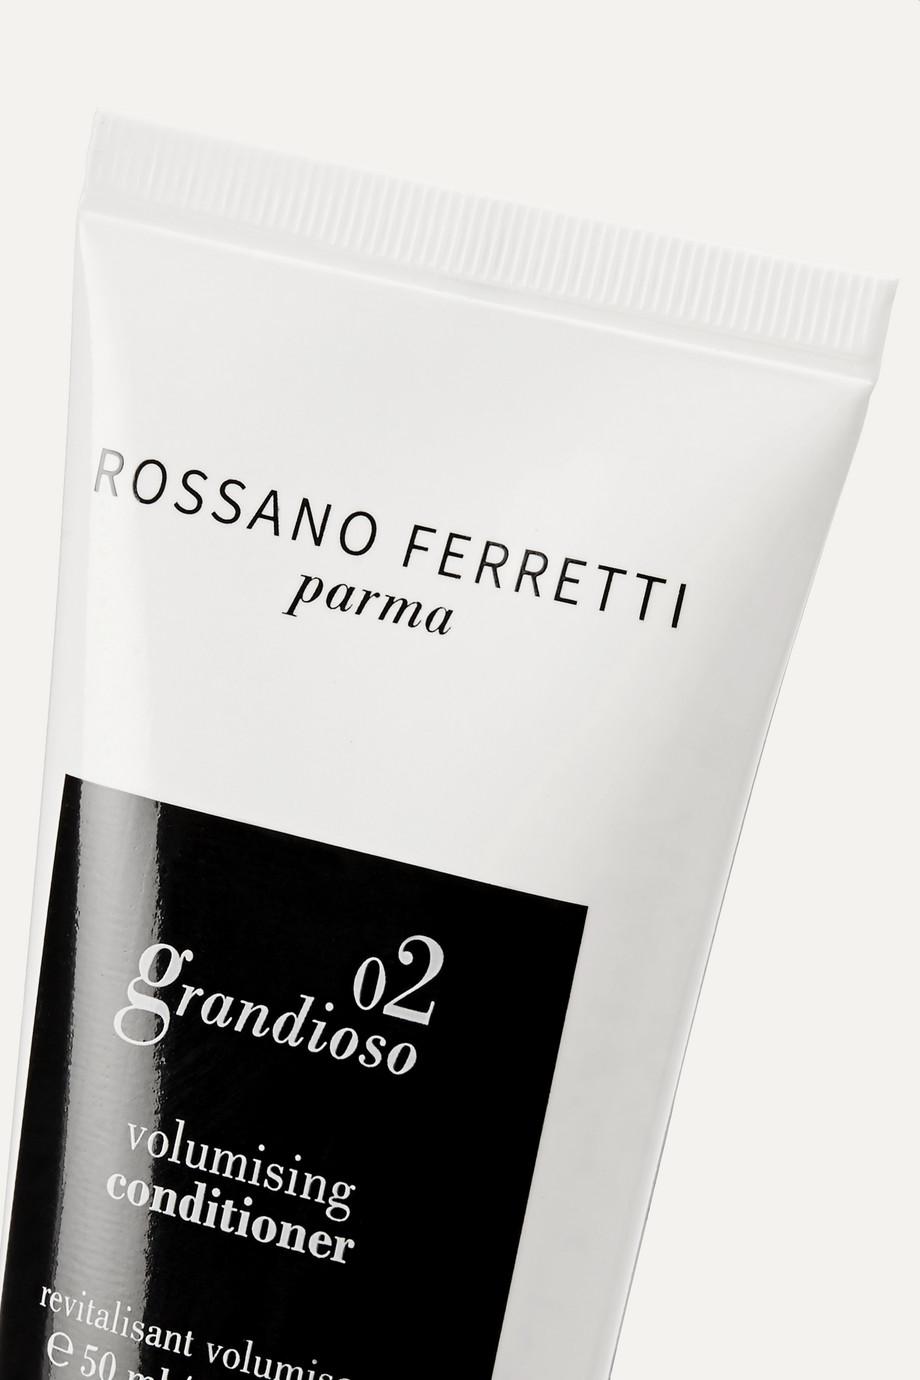 ROSSANO FERRETTI Parma Grandioso Volumising Conditioner, 50ml